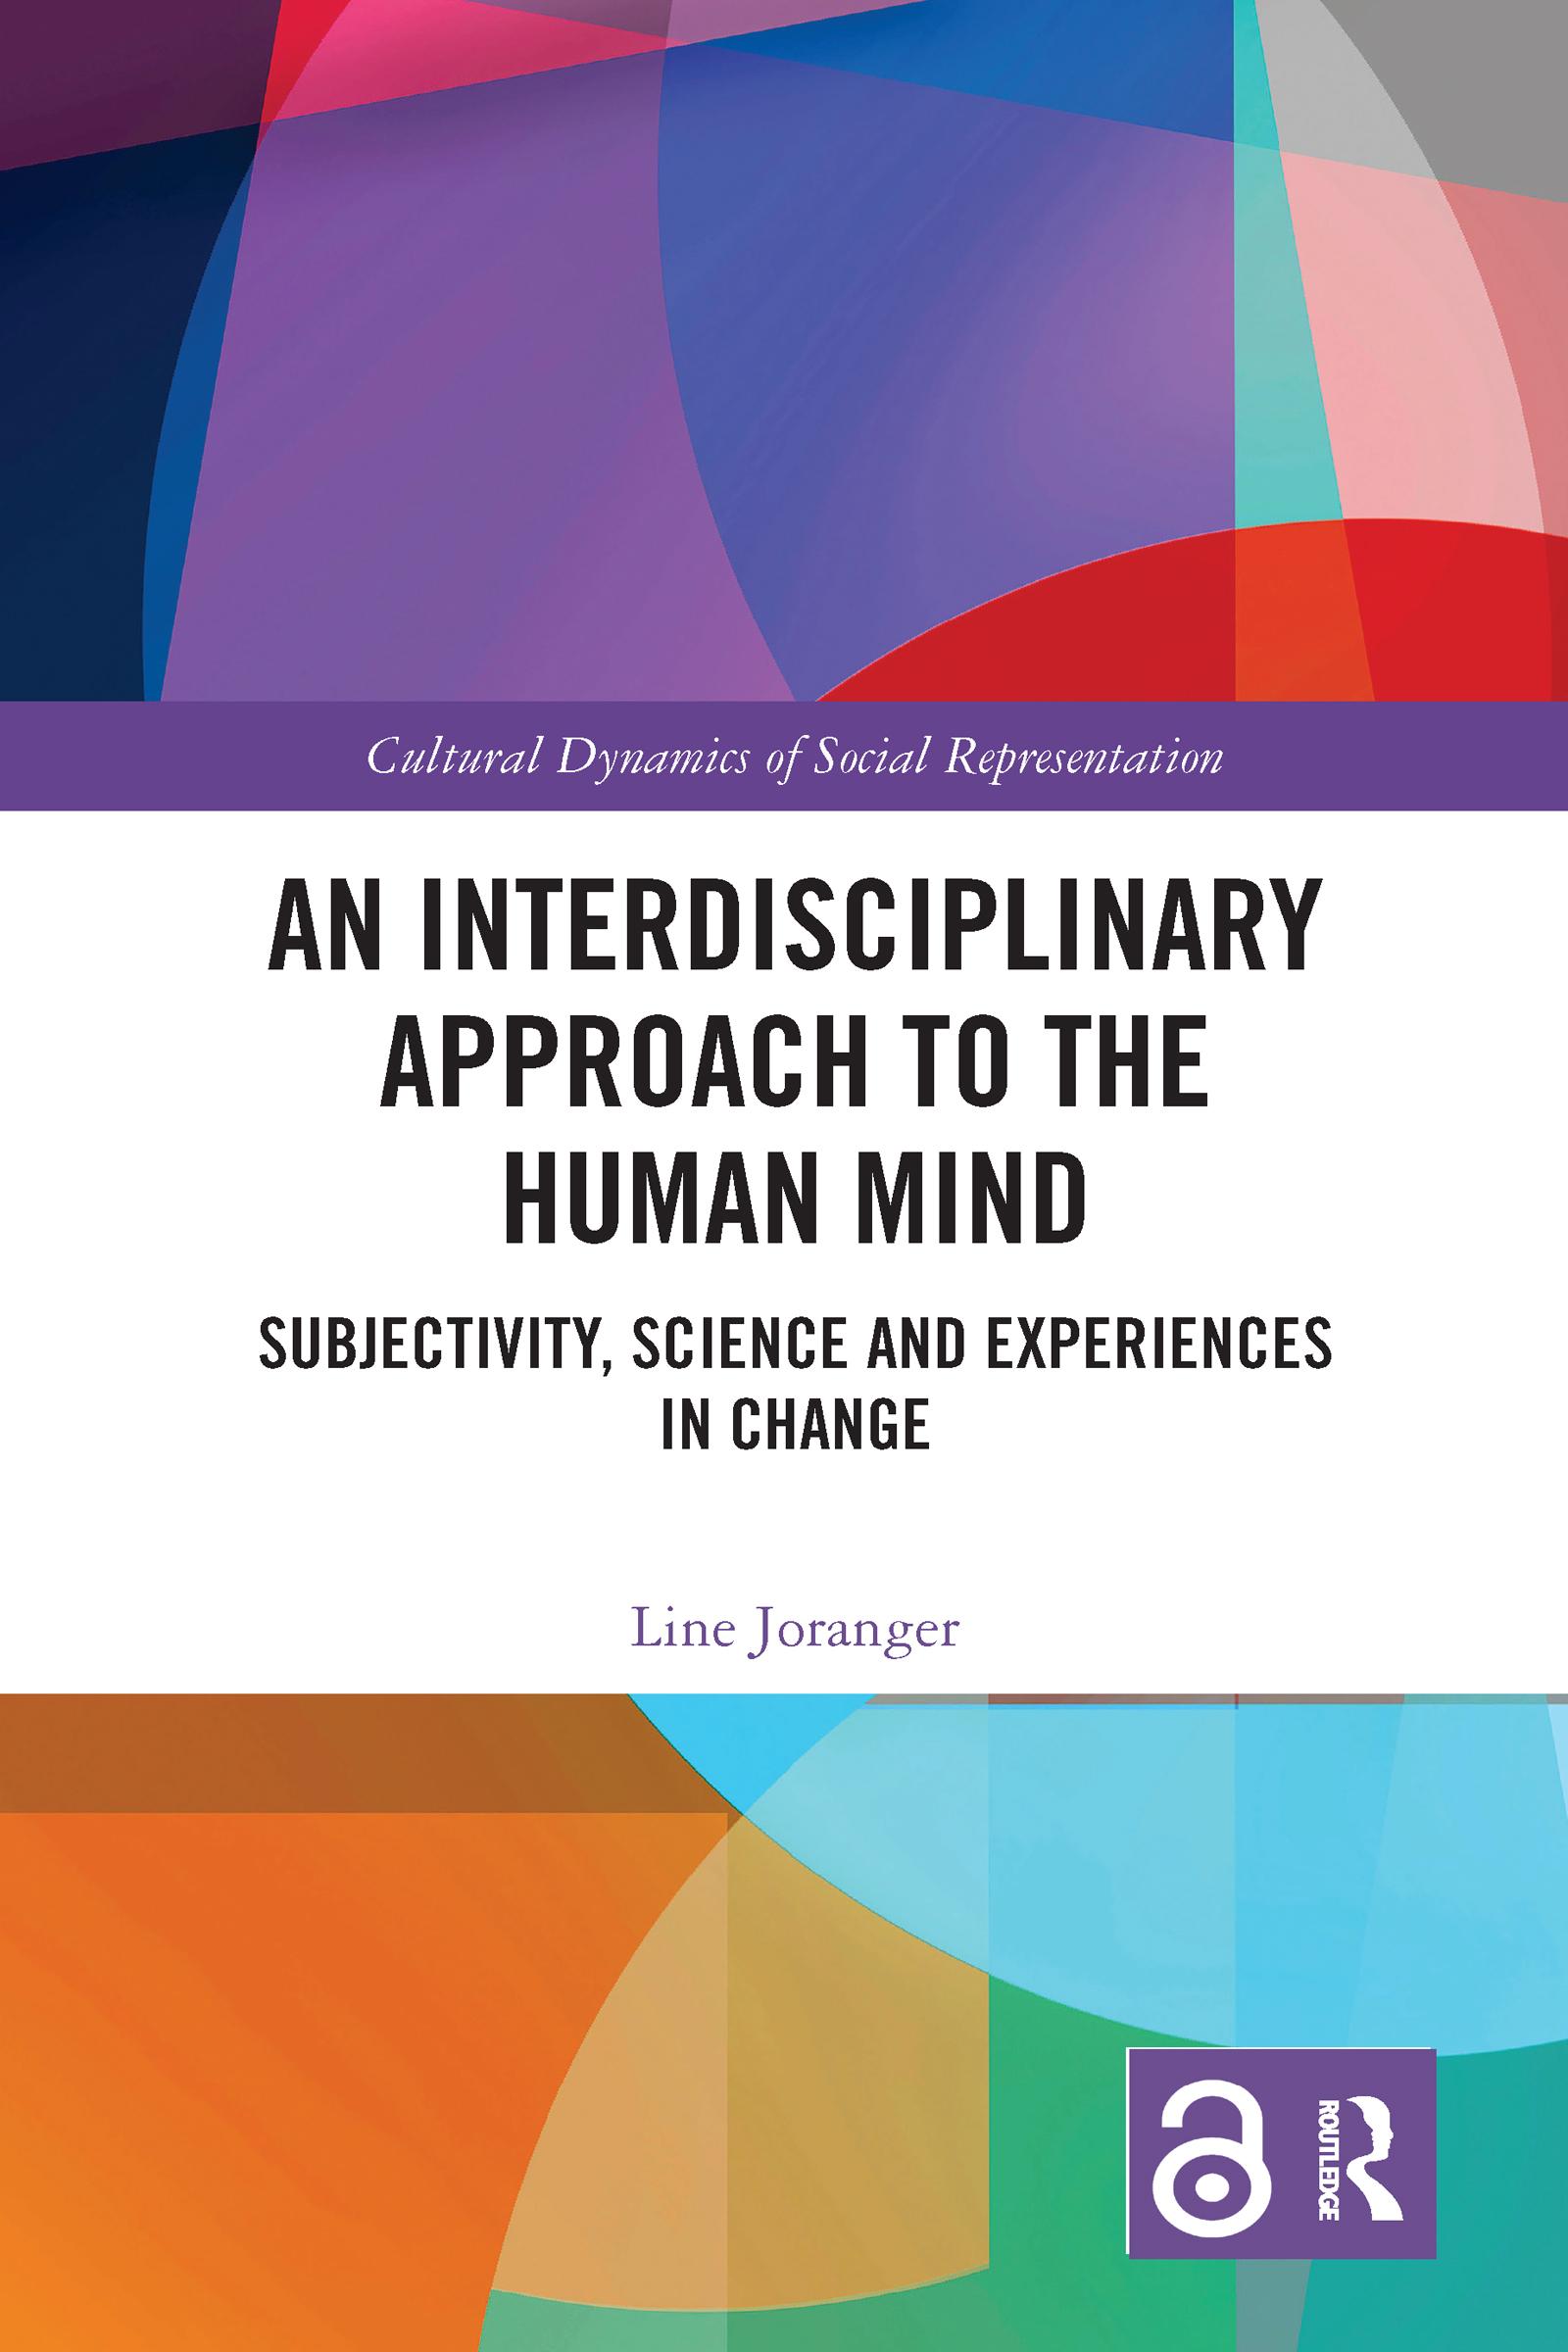 An Interdisciplinary Approach to the Human Mind